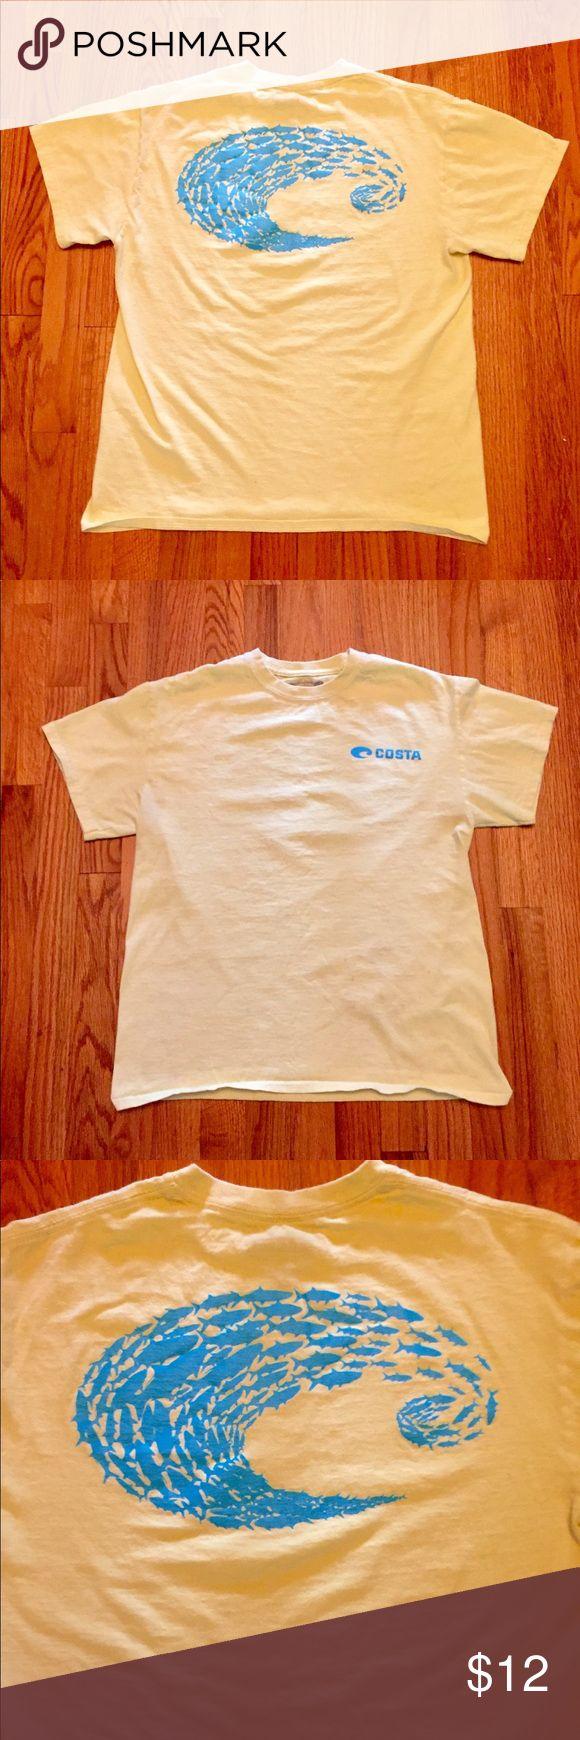 Costa Del Mar TShirt Costa Del Mar TShirt Costa Del Mar Shirts Tees - Short Sleeve